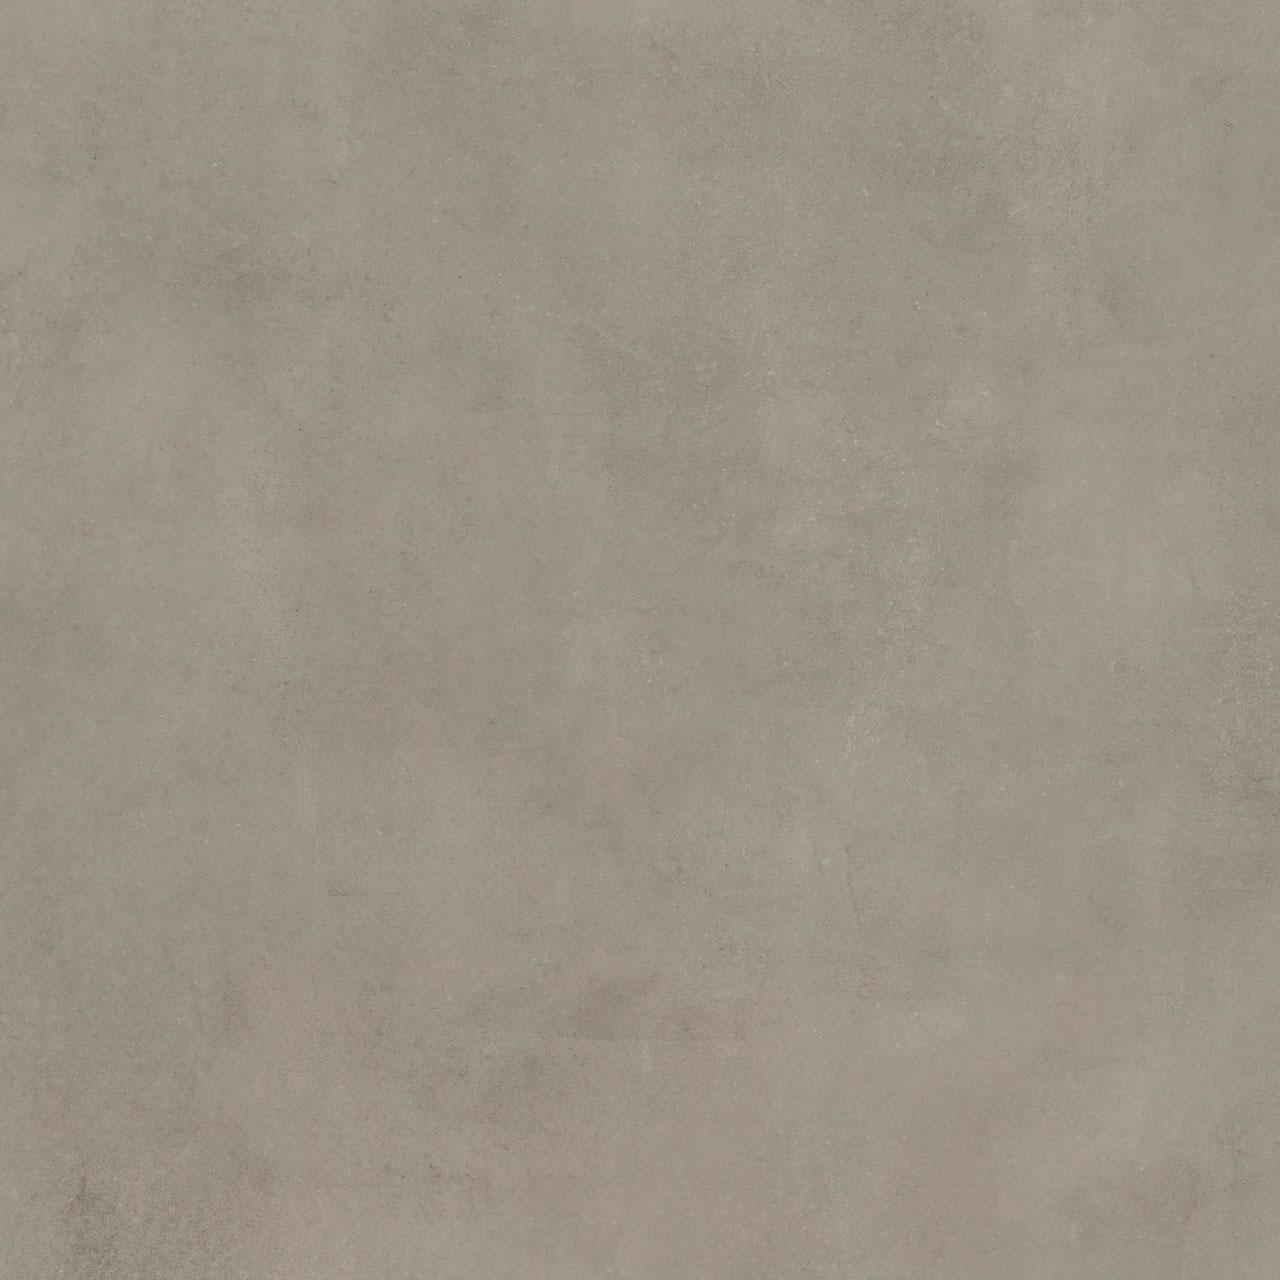 munari concreto po 59×59